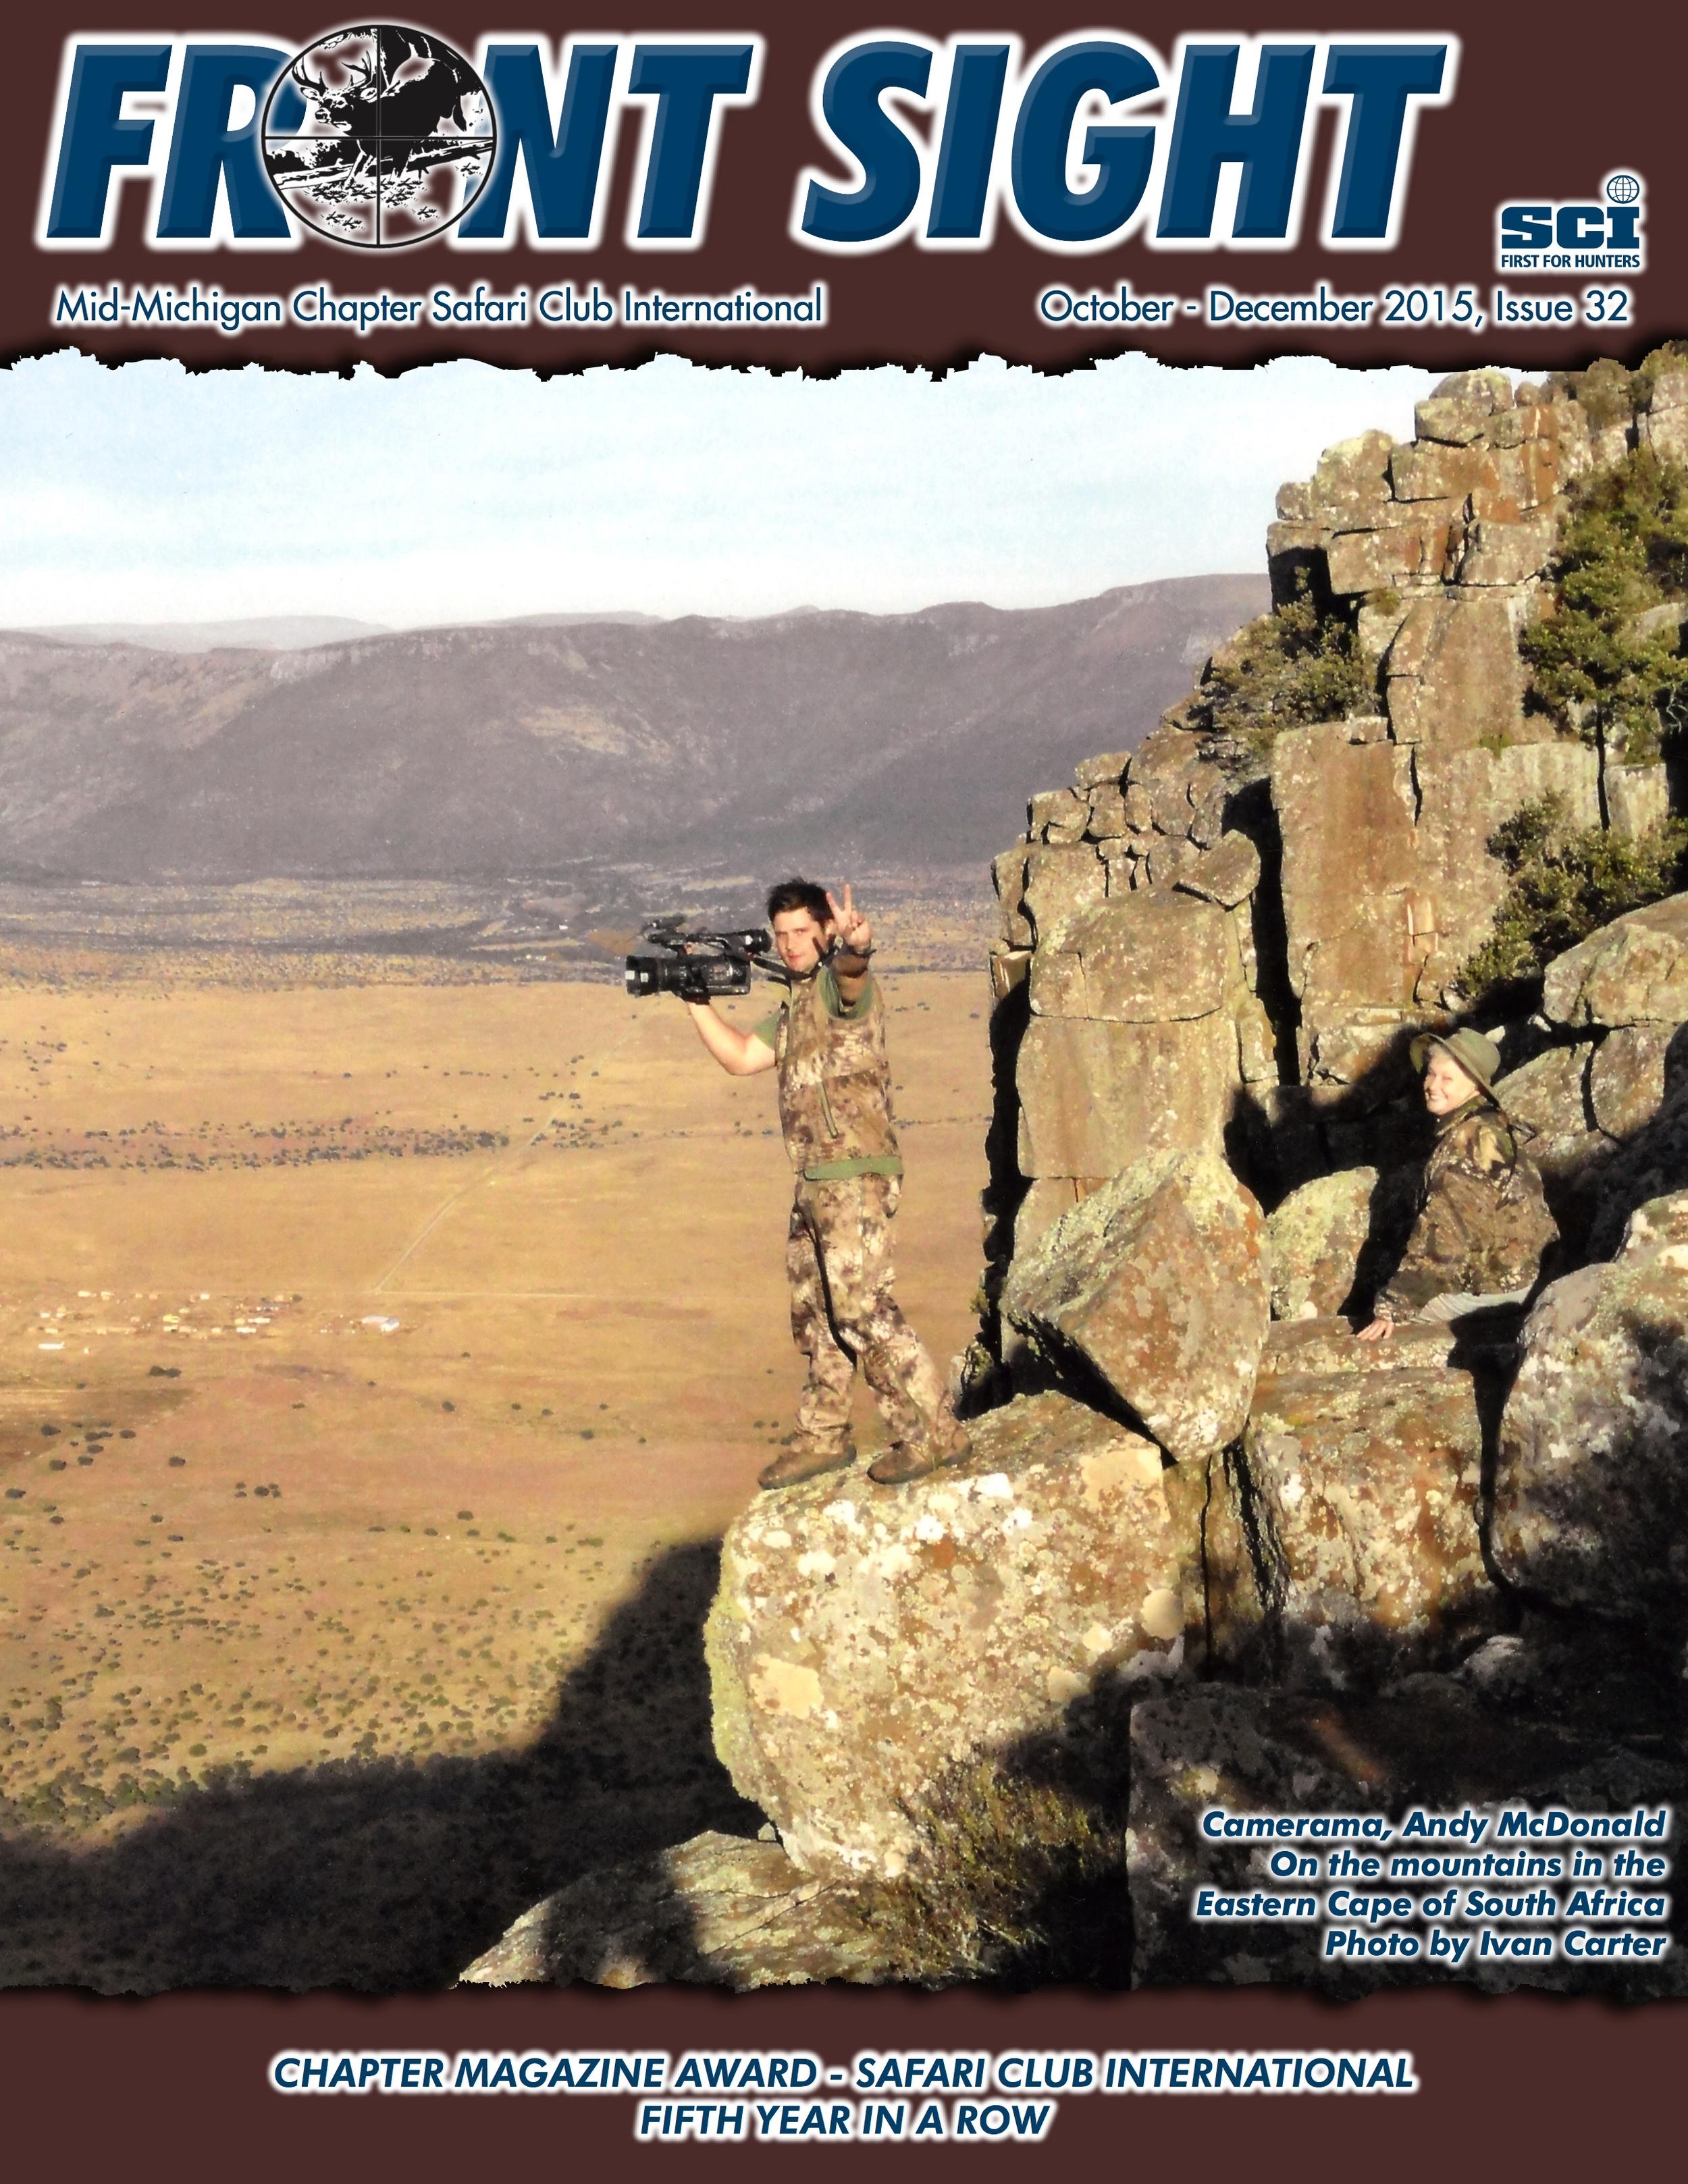 Issue 32, October 2015